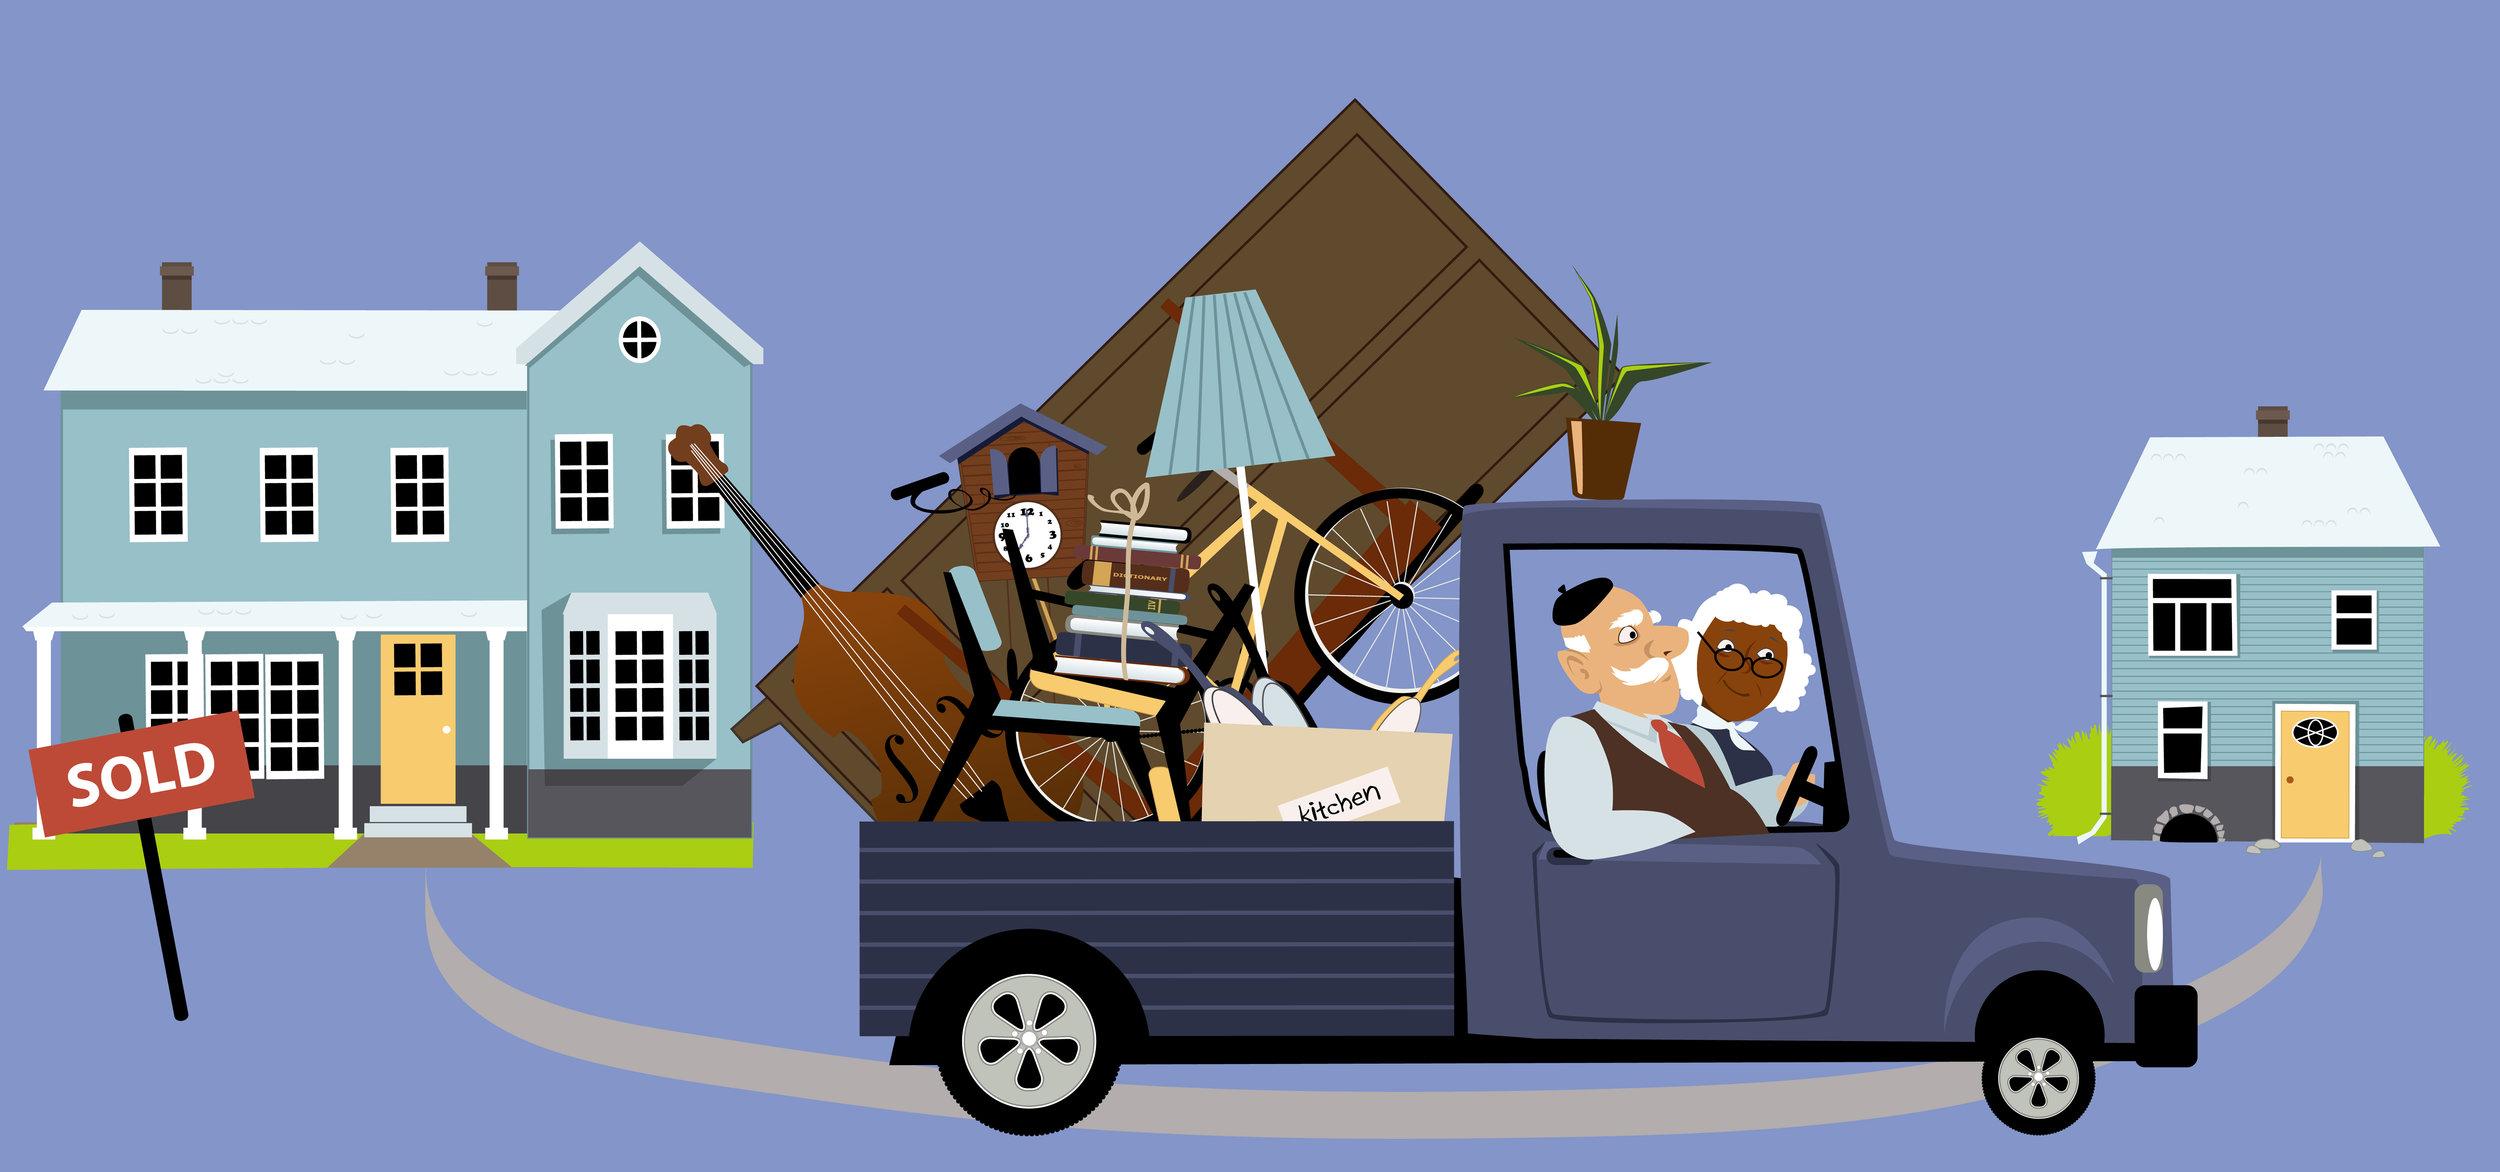 downsizing-home-retirement.jpg